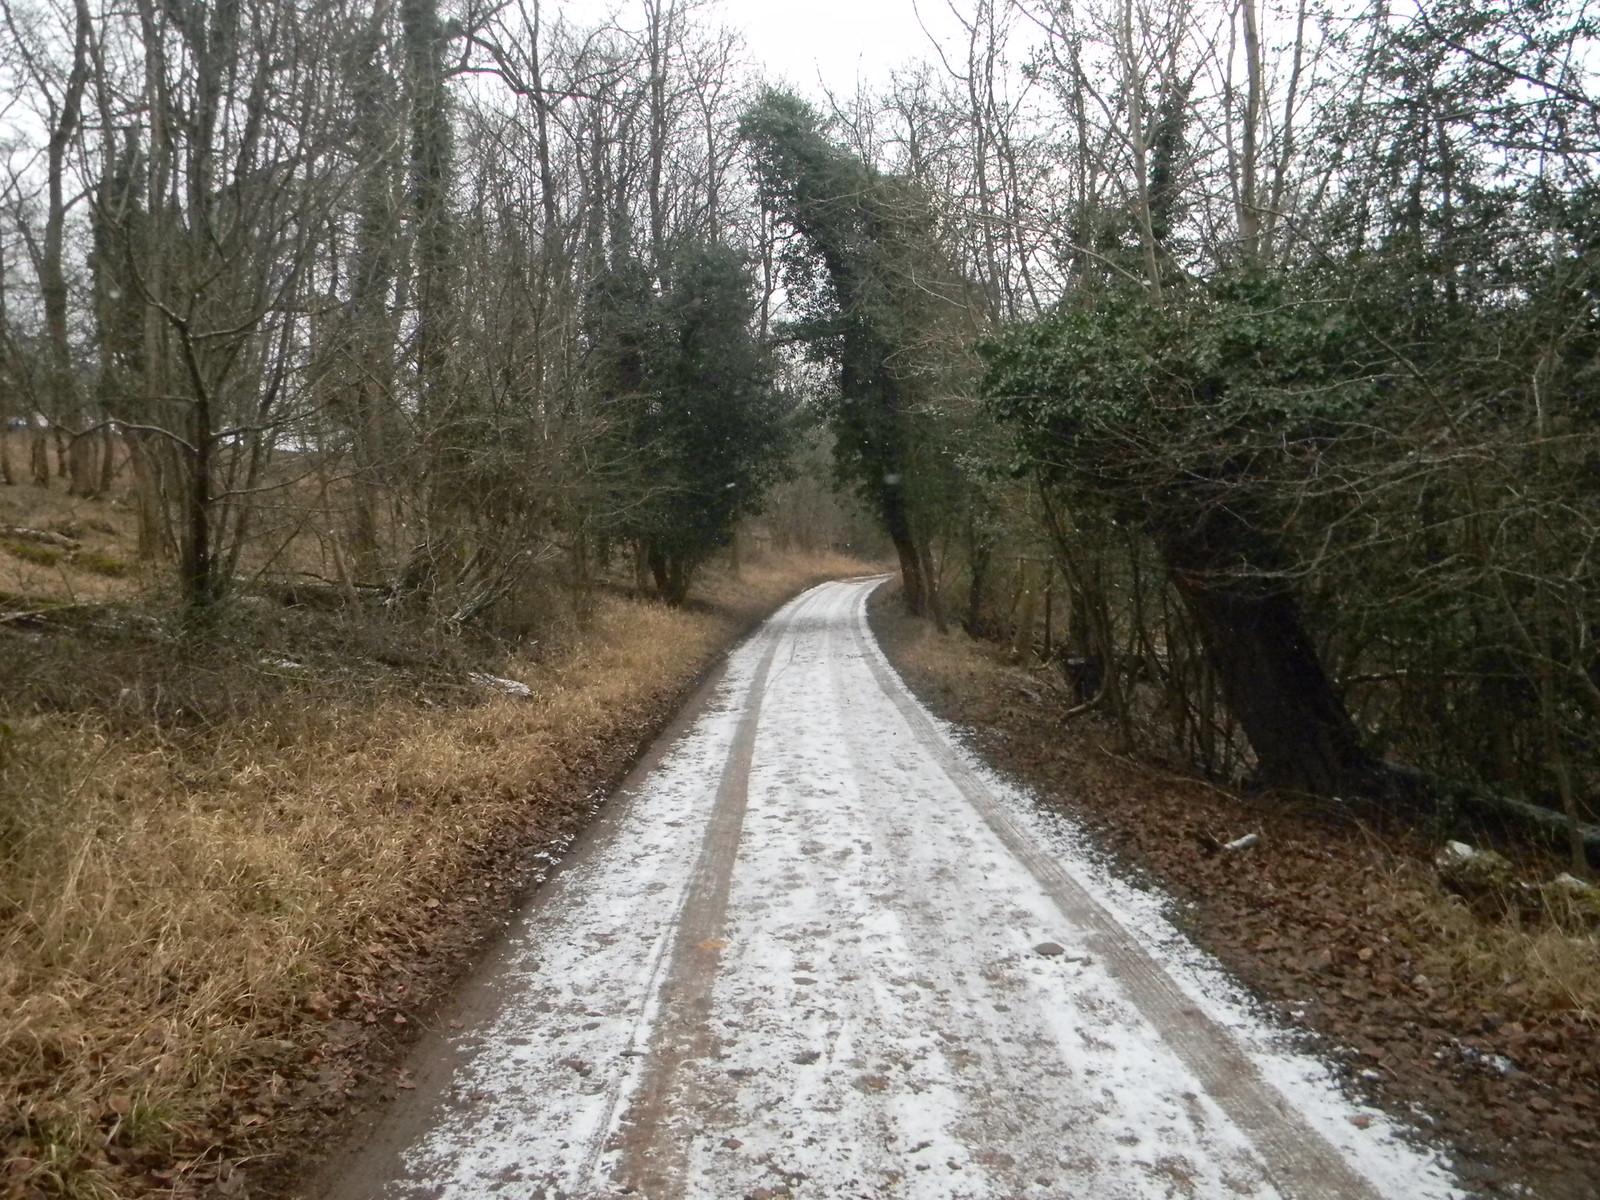 Snowy path 3 Tring to Berkhamsted (via shortcut)